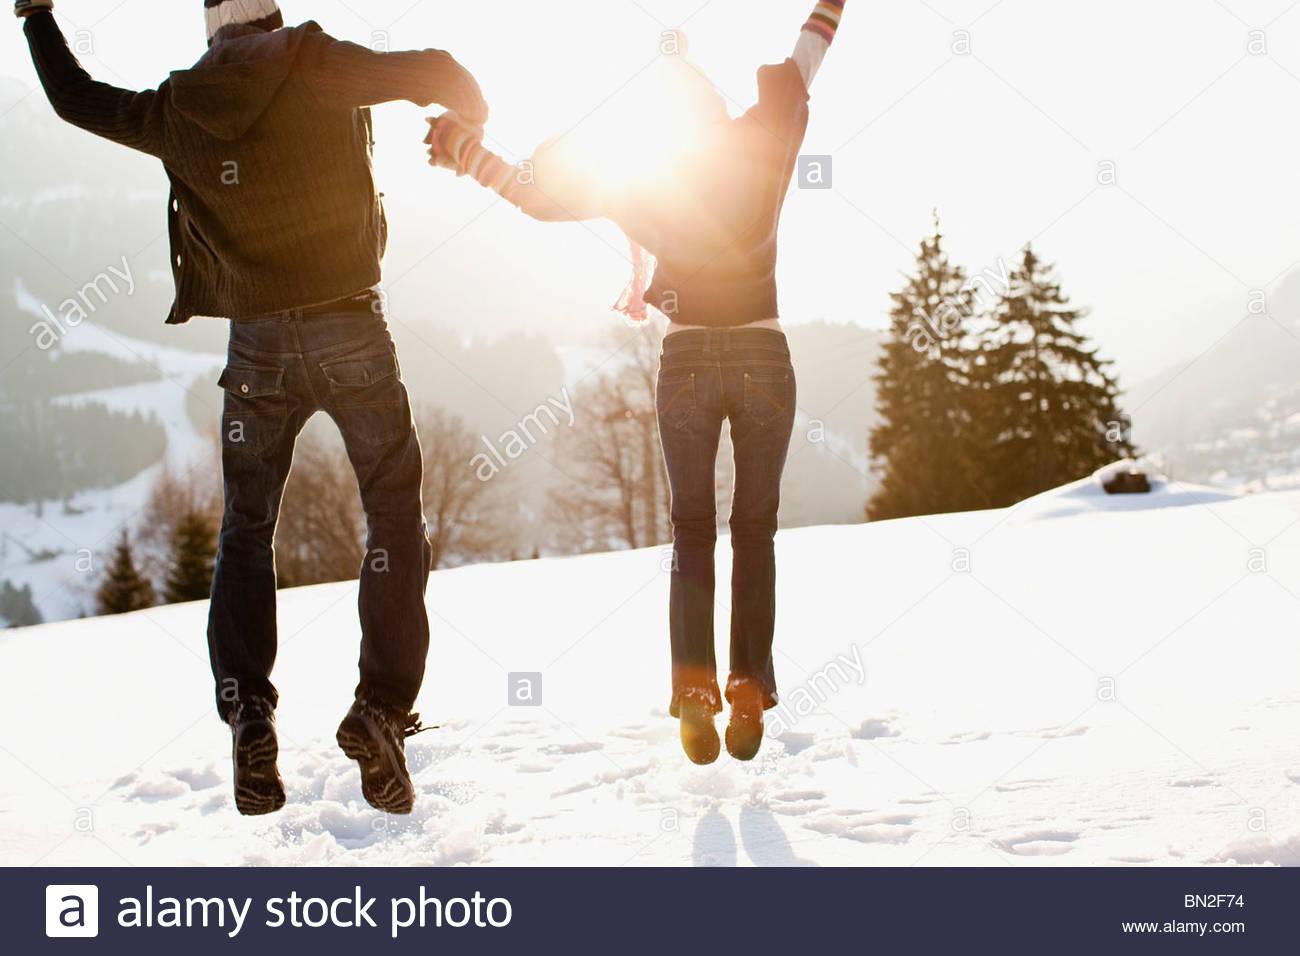 Par saltar afuera en la nieve Foto de stock